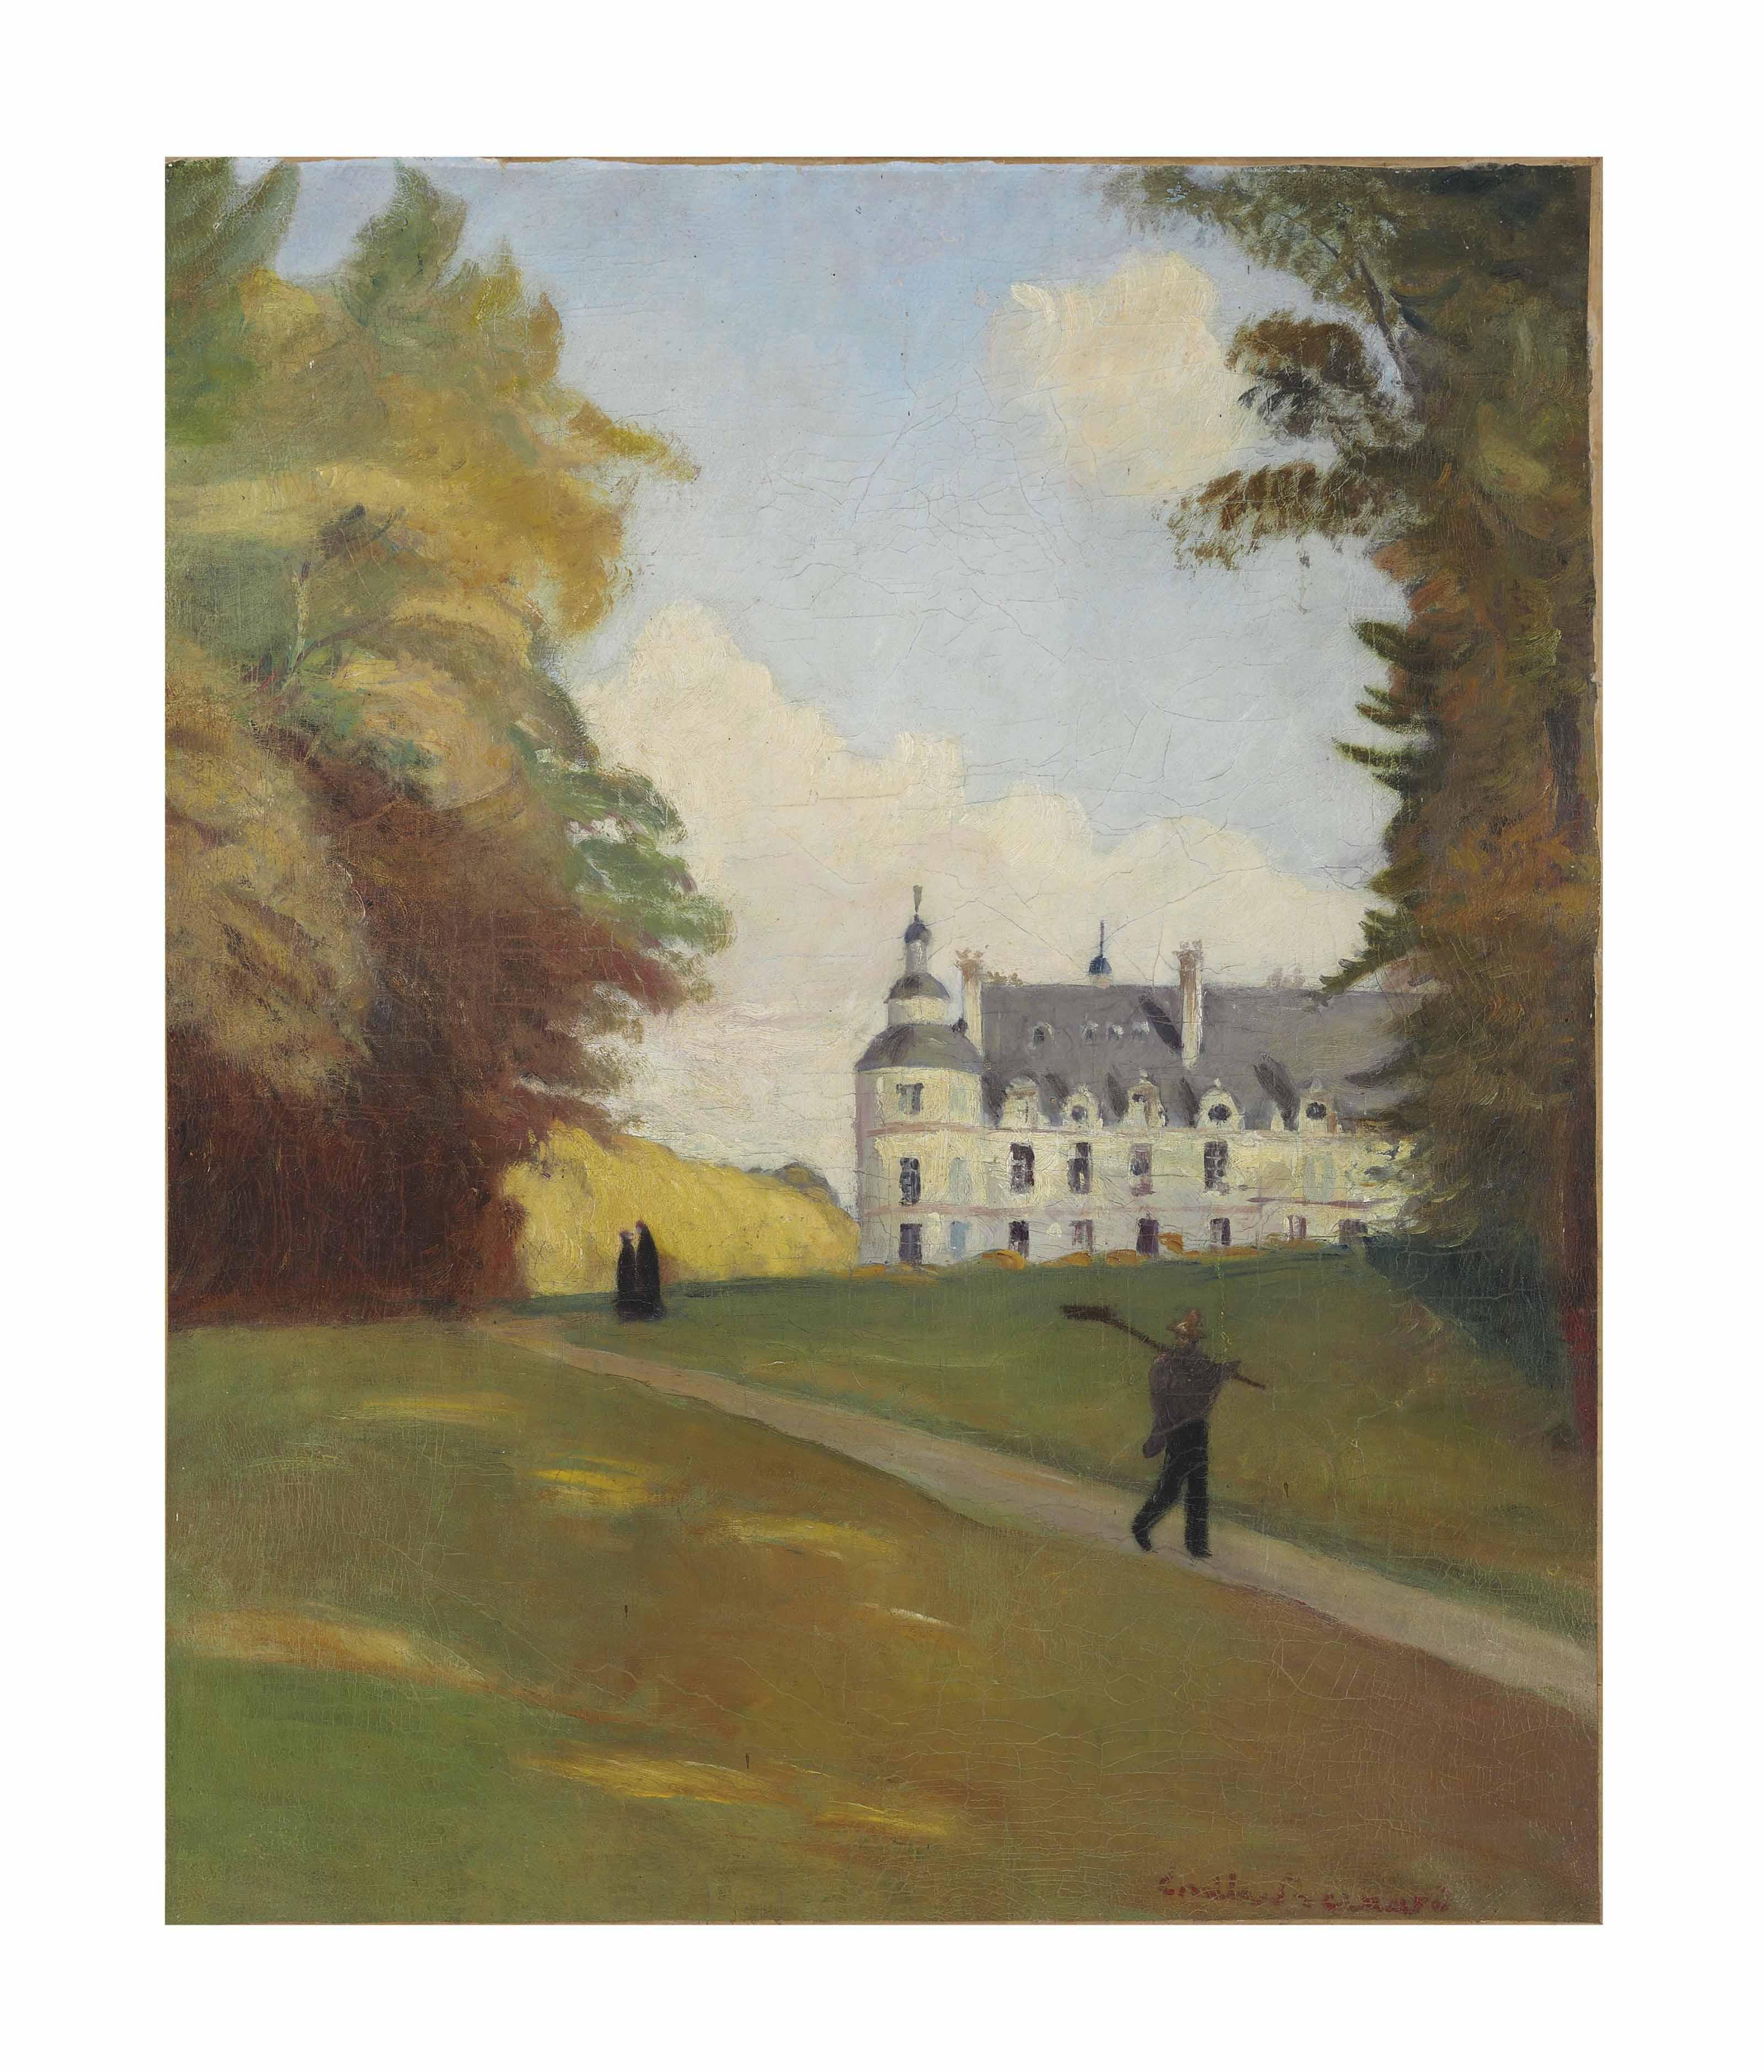 Emile Bernard (French, 1868-19